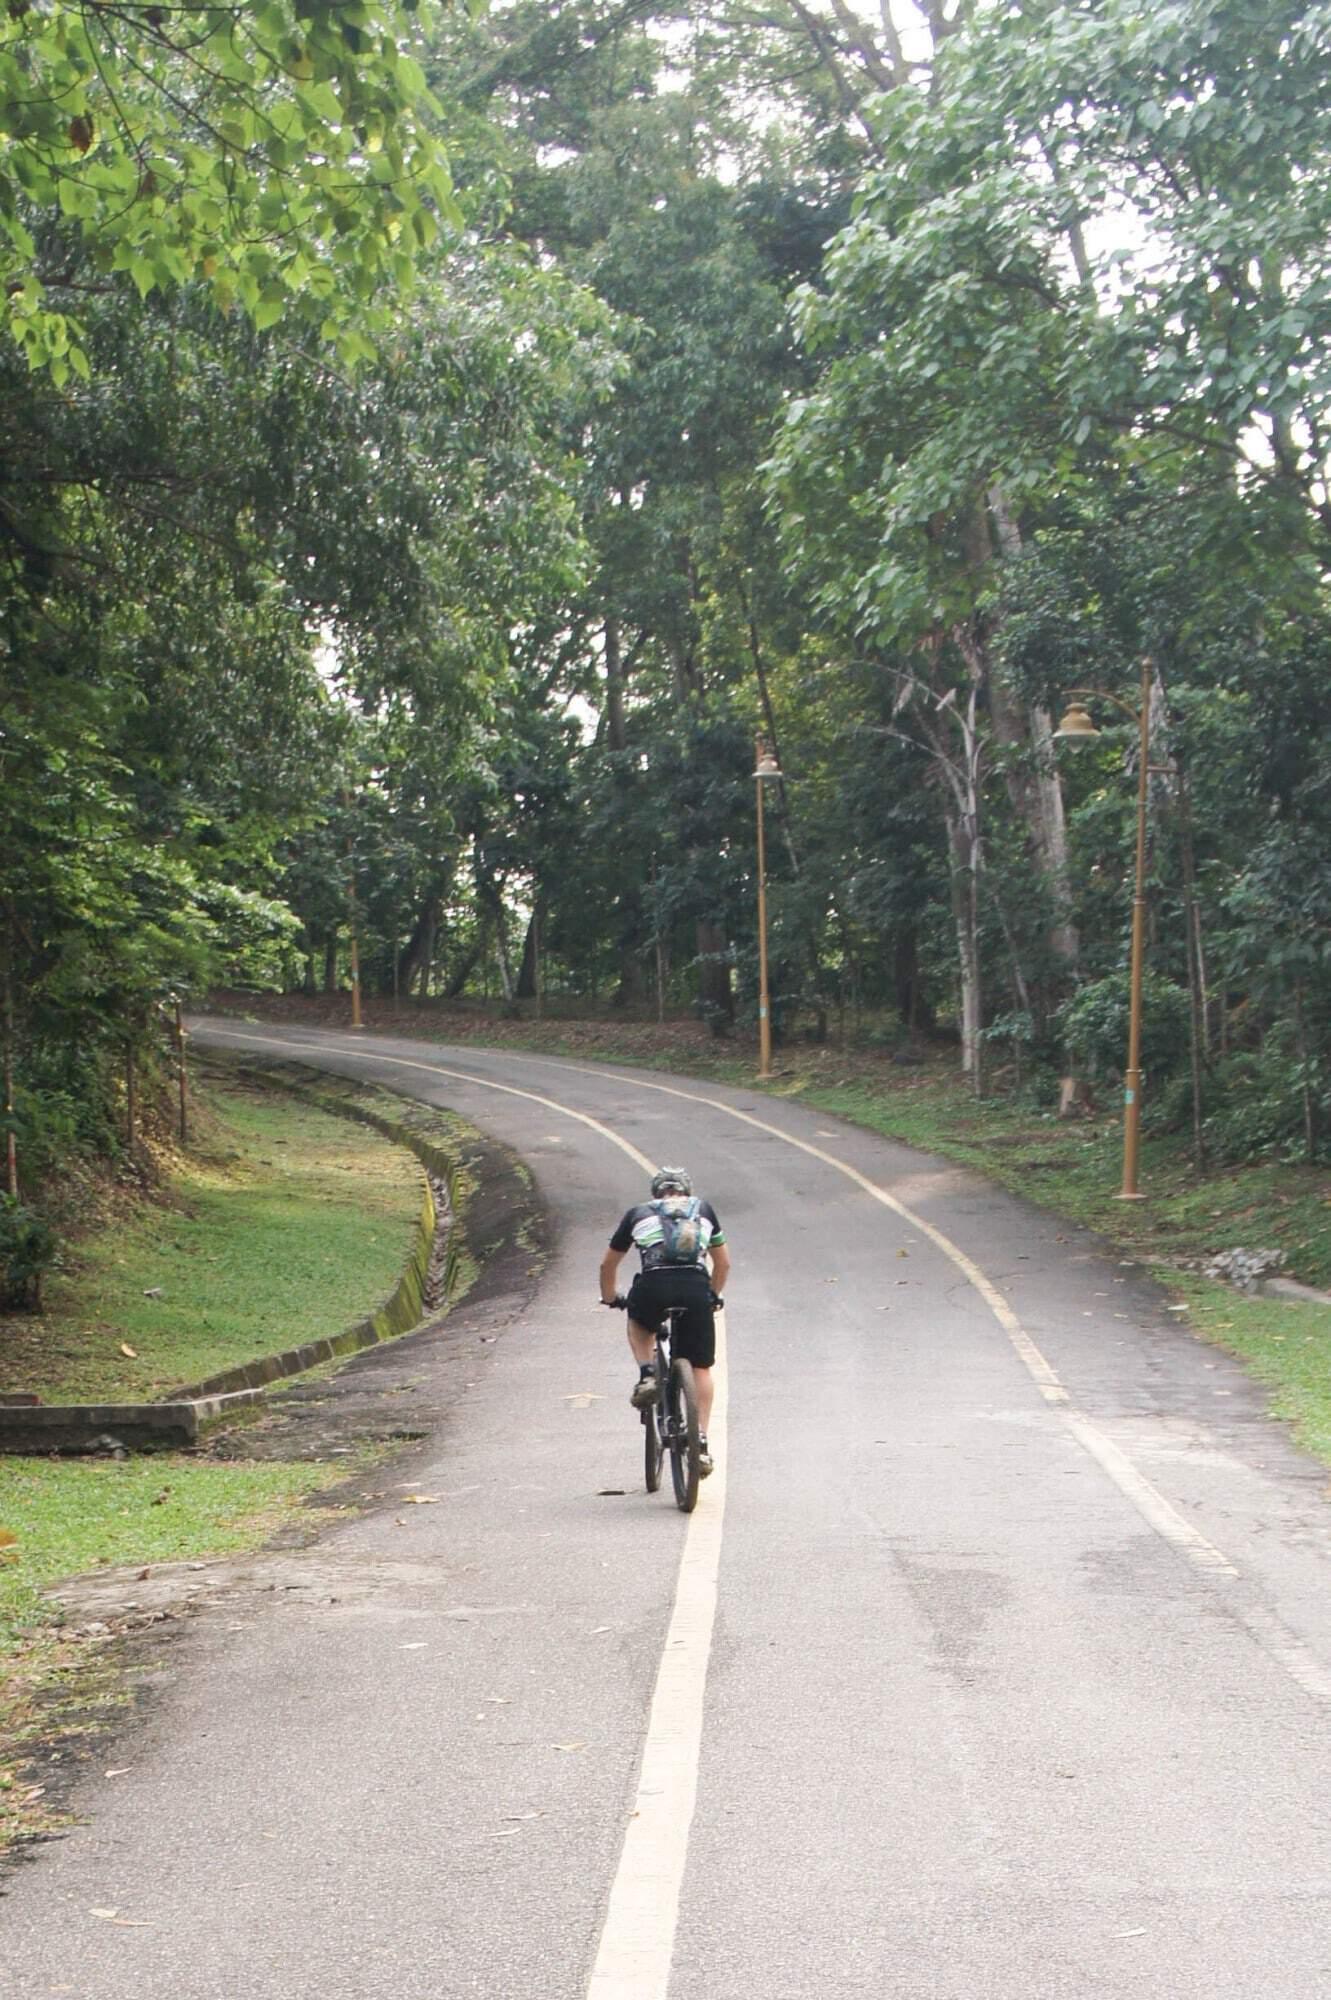 Biker at Bukit Kiara